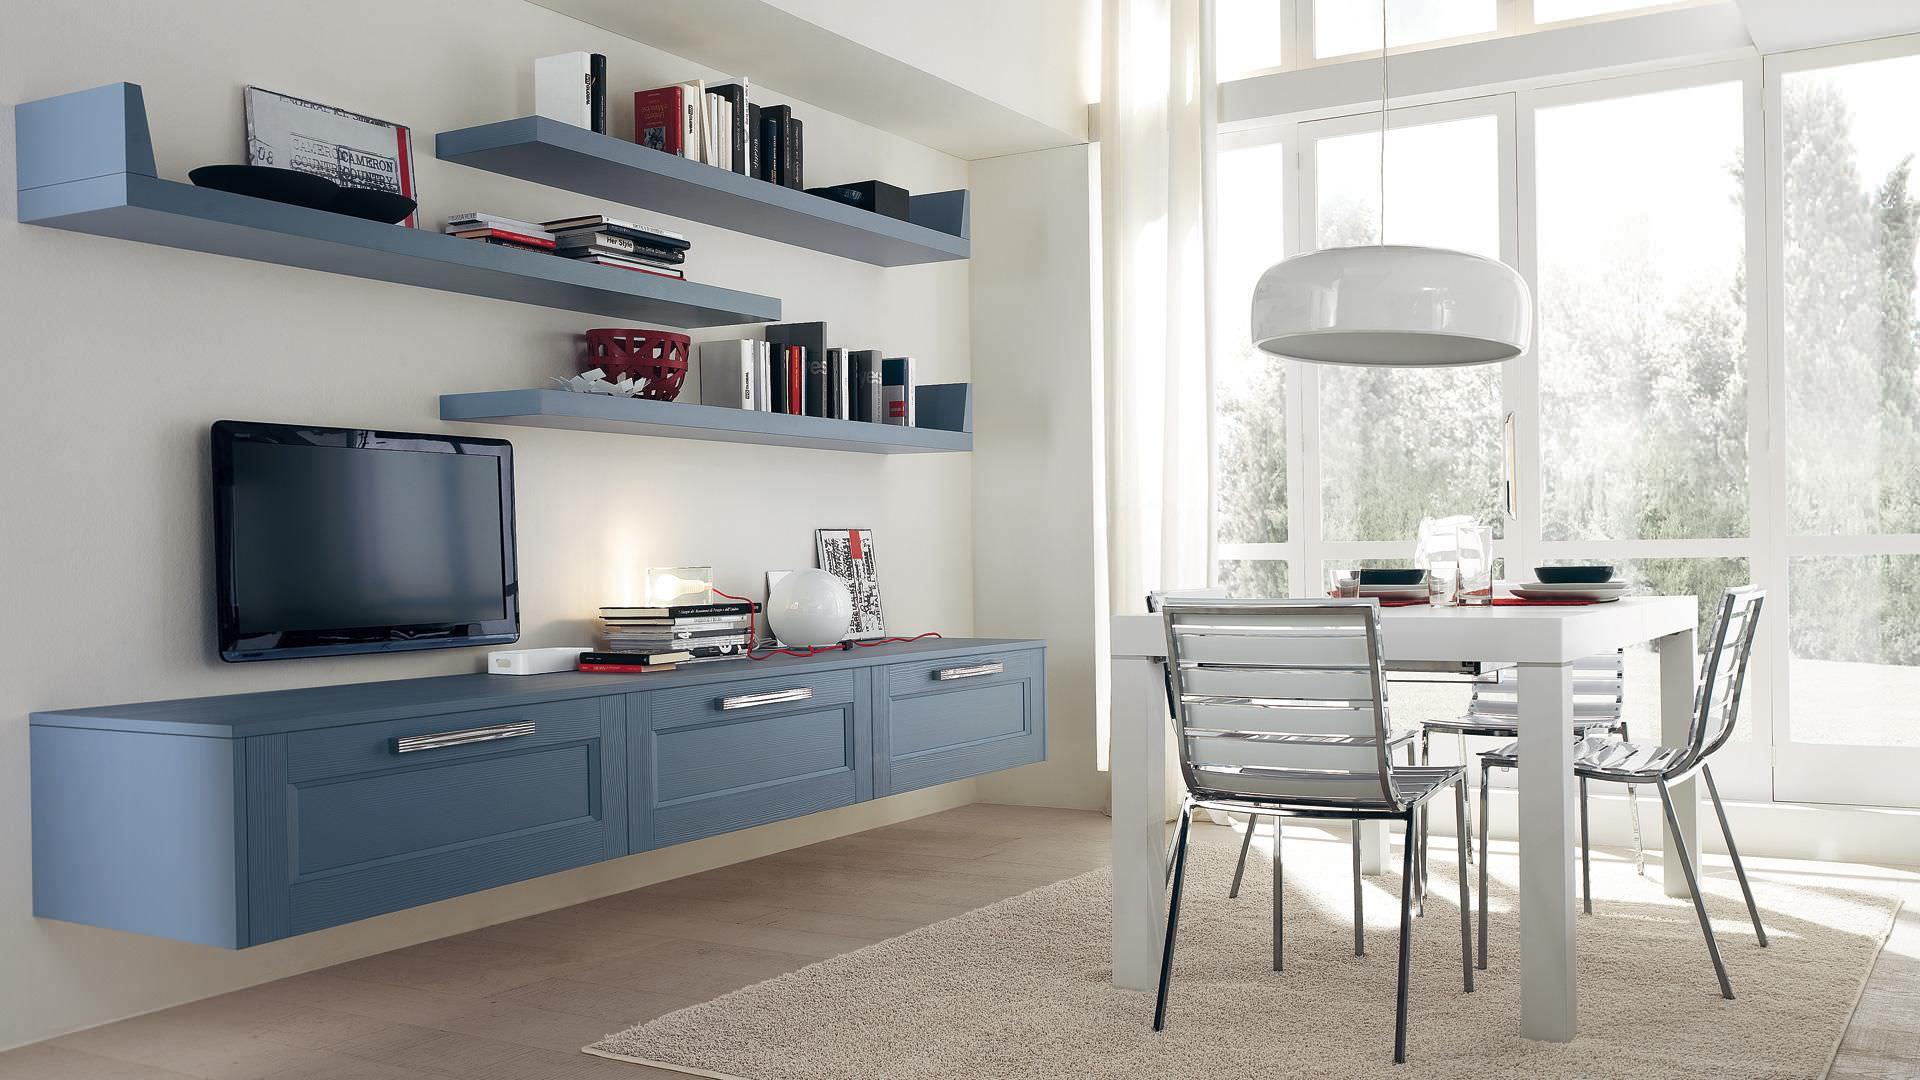 Mensola / classico / in legno / da cucina - GEORGIA - CUCINE LUBE ...